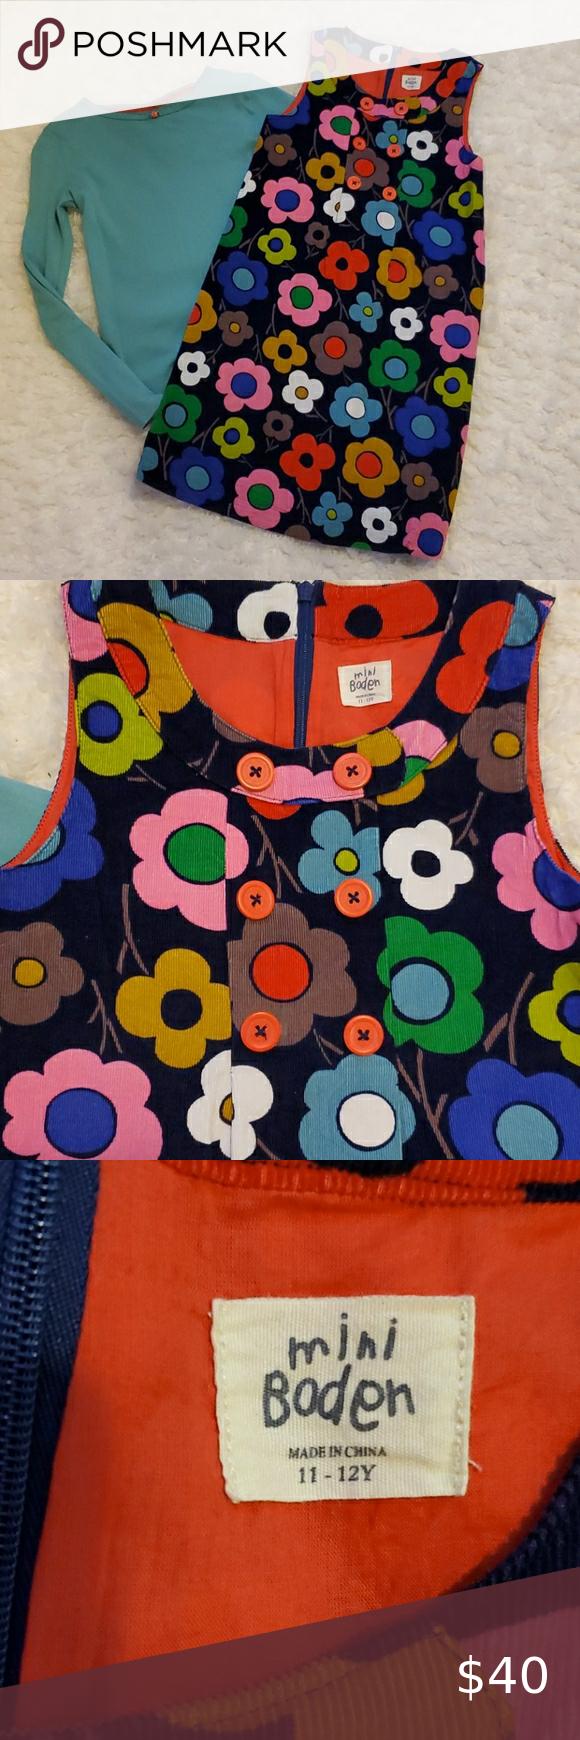 NWOT Mini Boden Girls Corduroy  Dark Blue Dress Size 12-18 Months